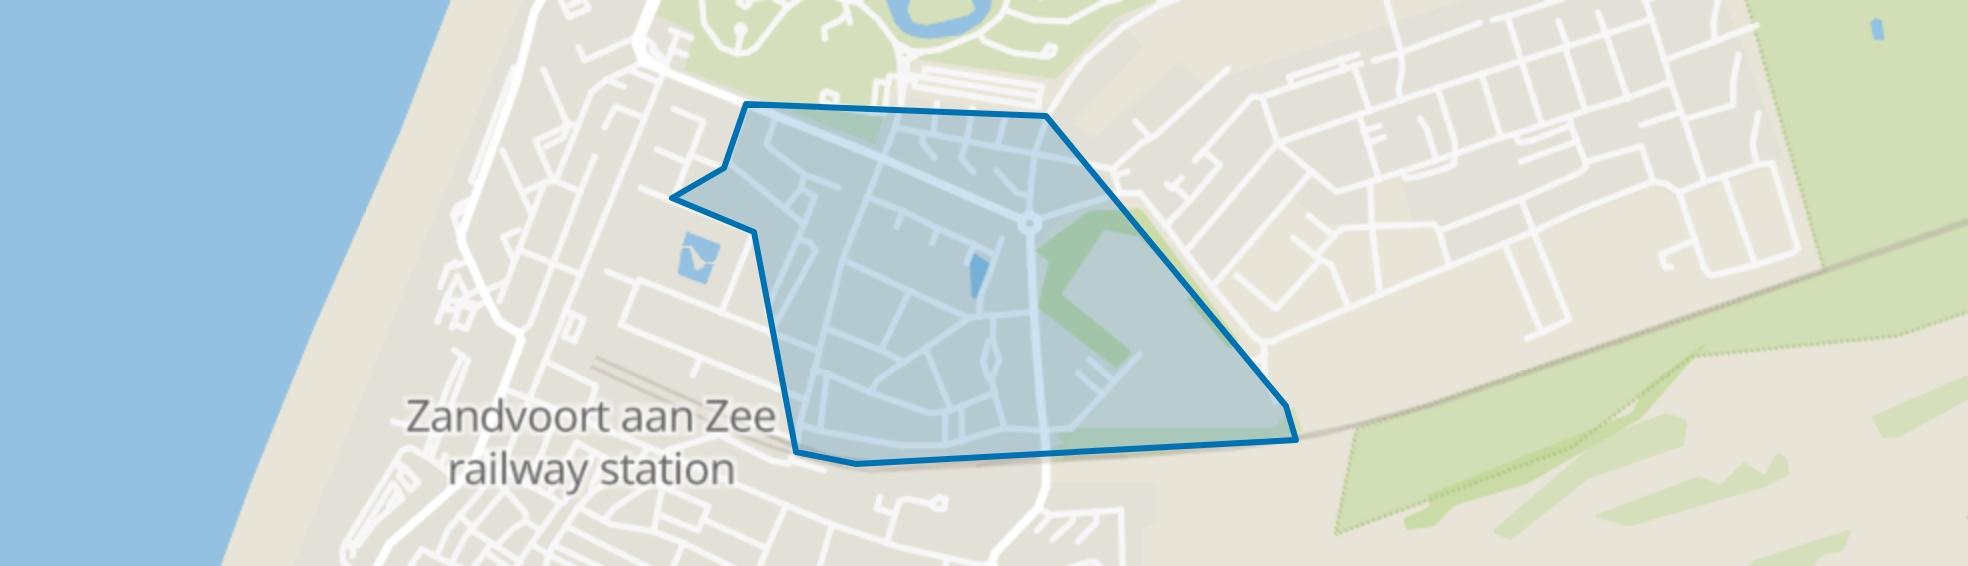 Oud Noord, Zandvoort map